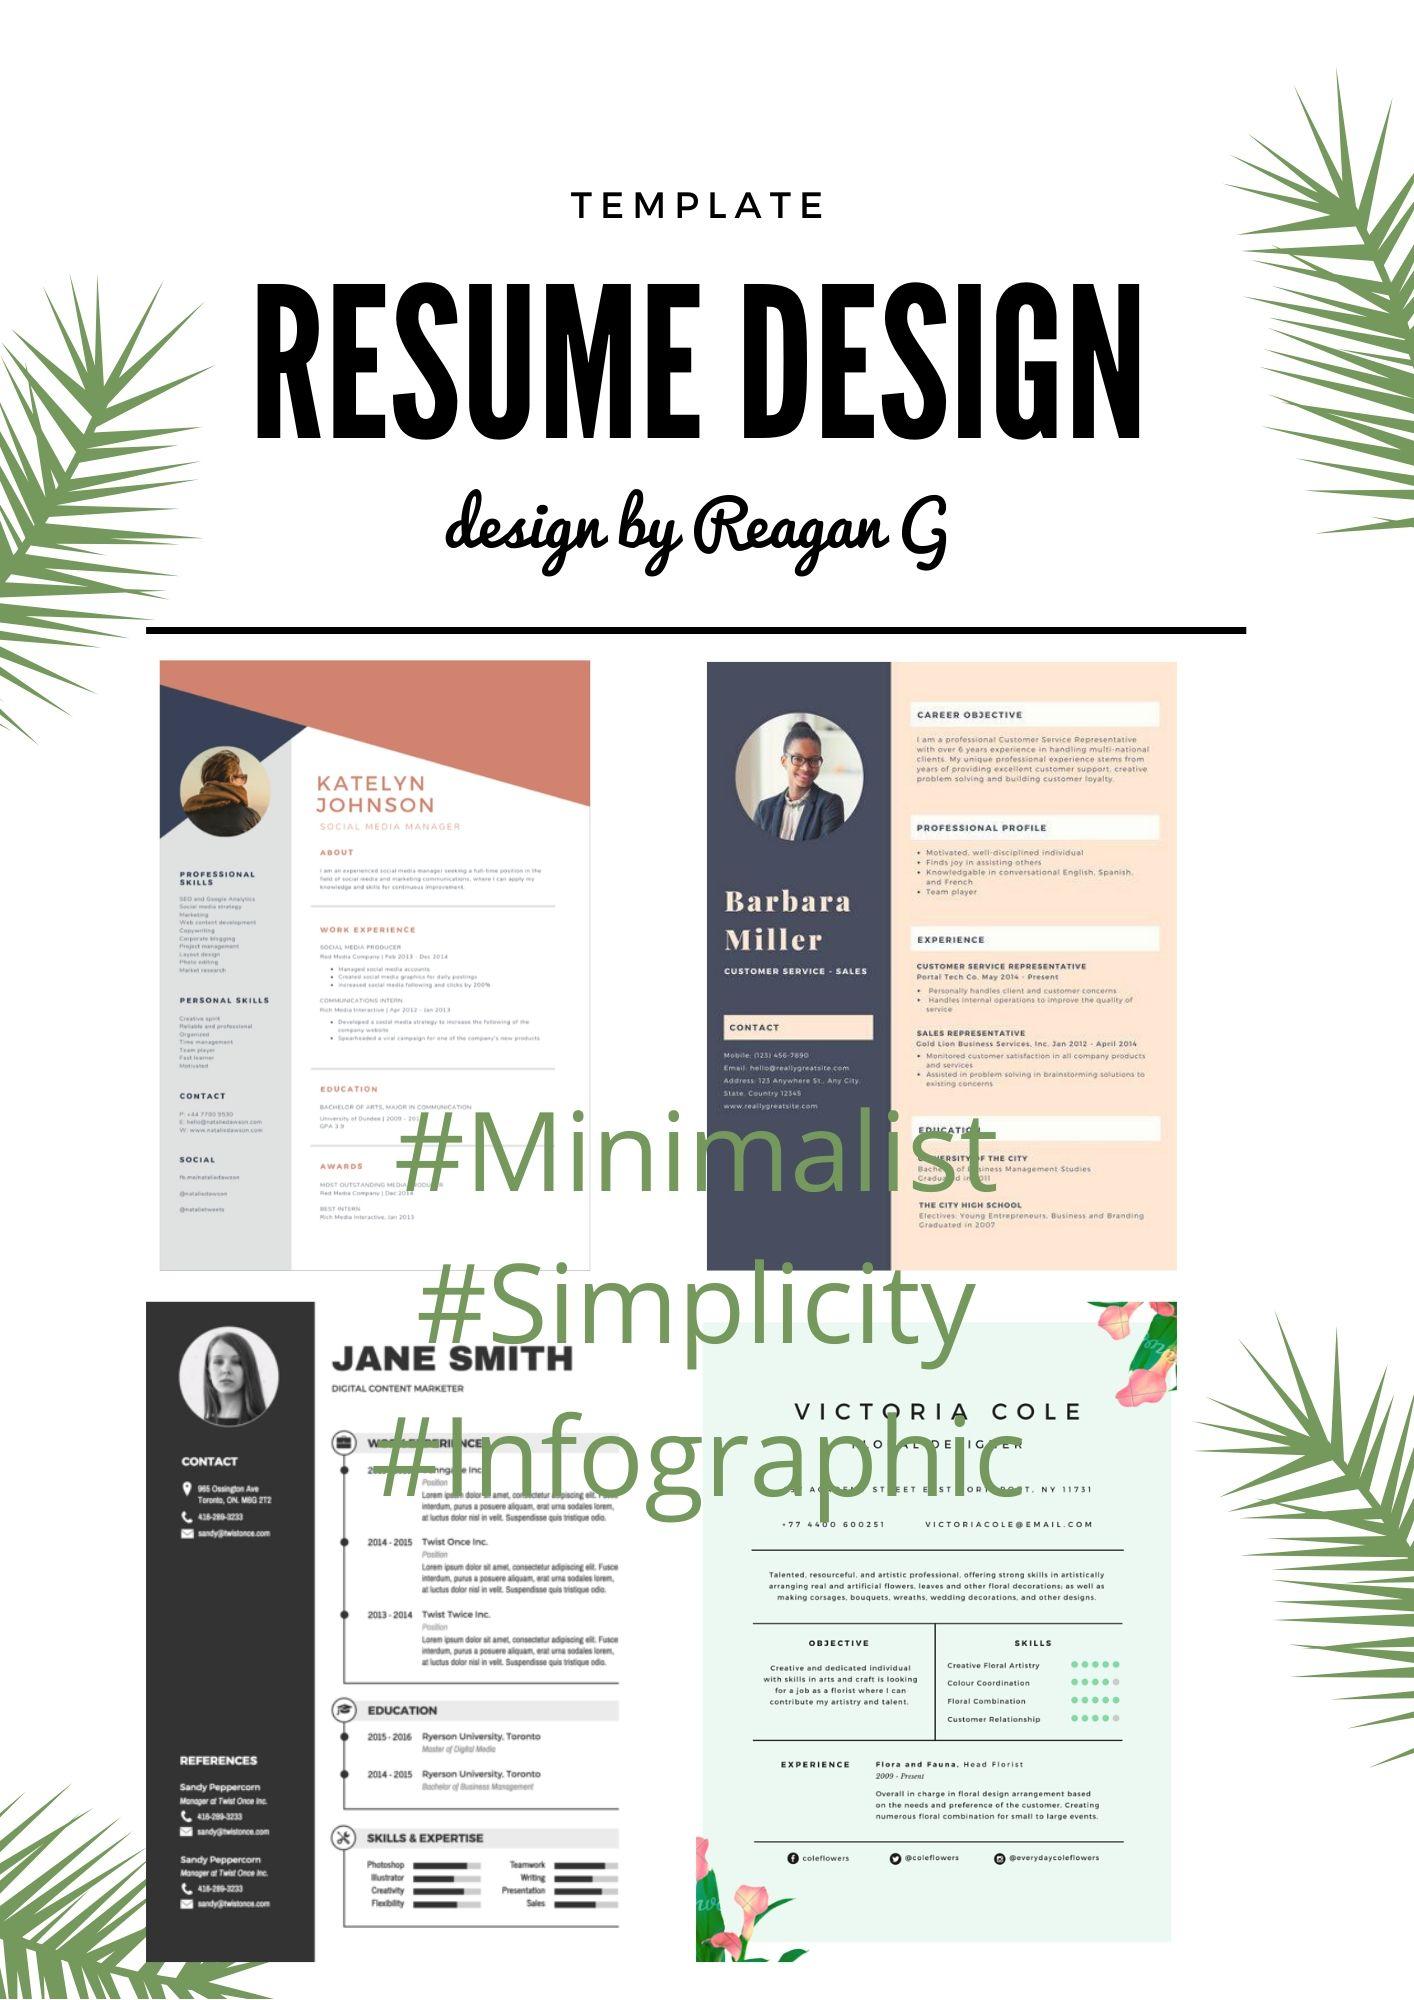 Professional,  Creative,  Infographic RESUME/ CV/ PORTFOLIO Design